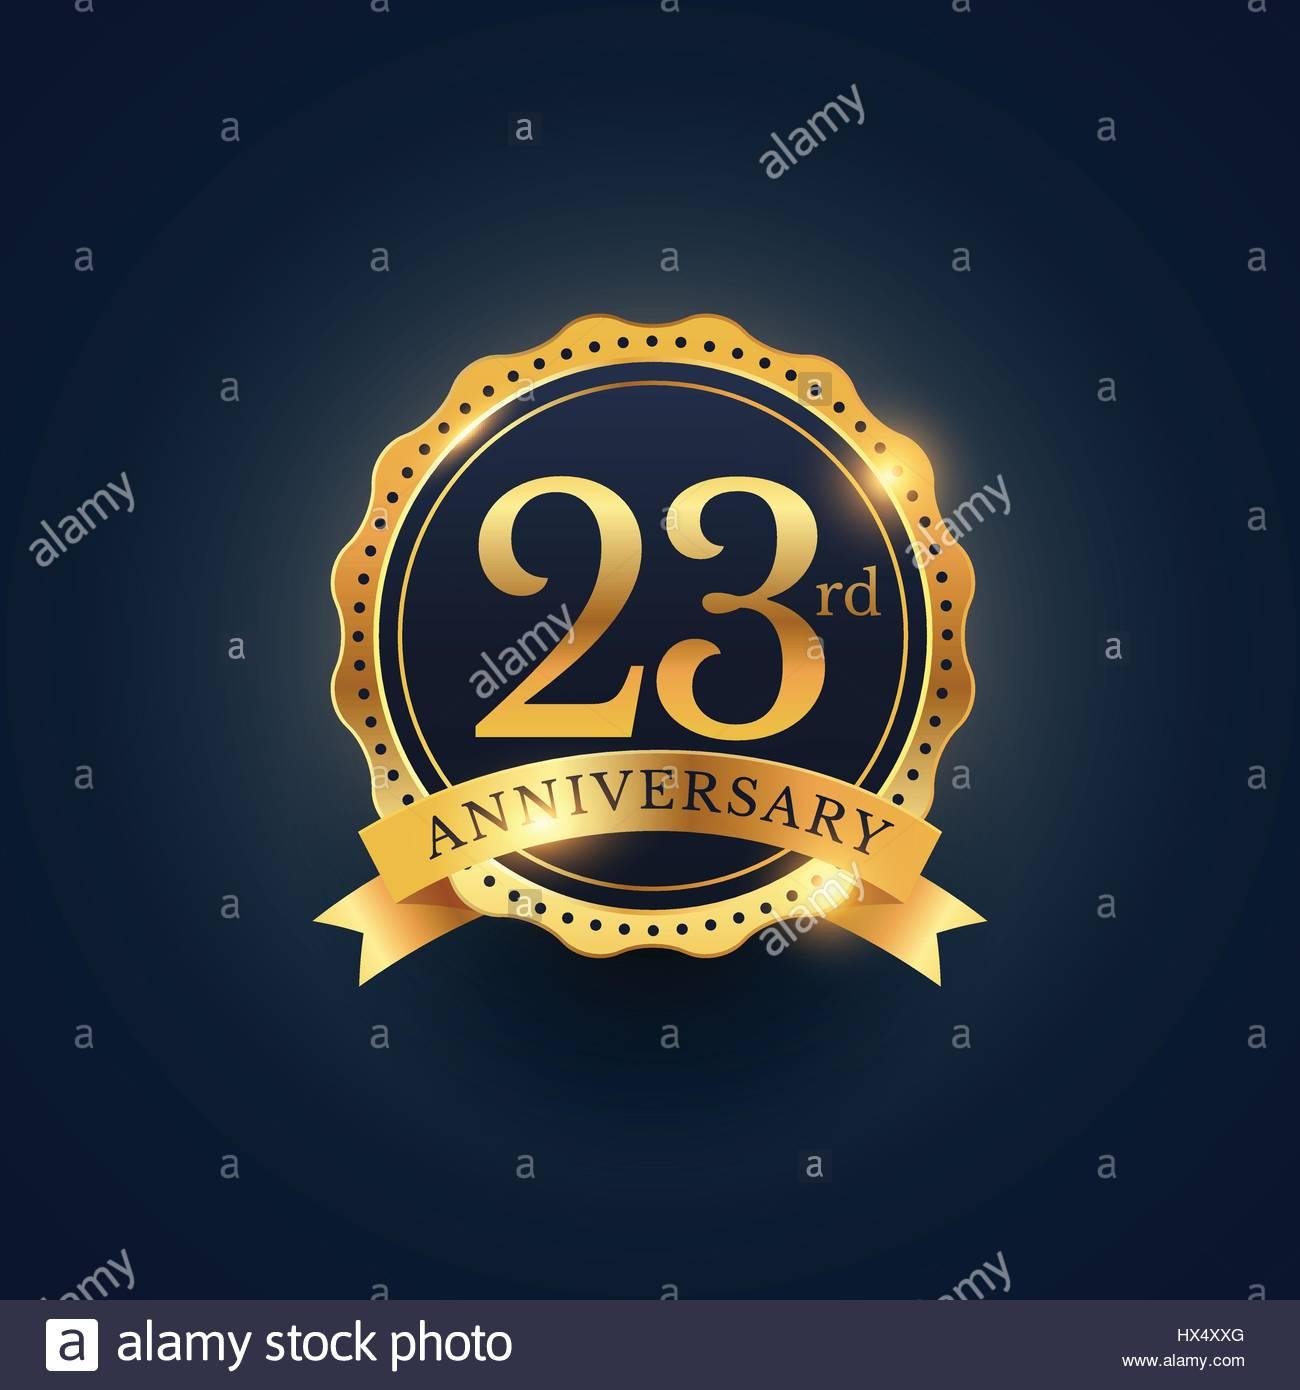 23rd anniversary celebration badge label in golden color - Stock Vector